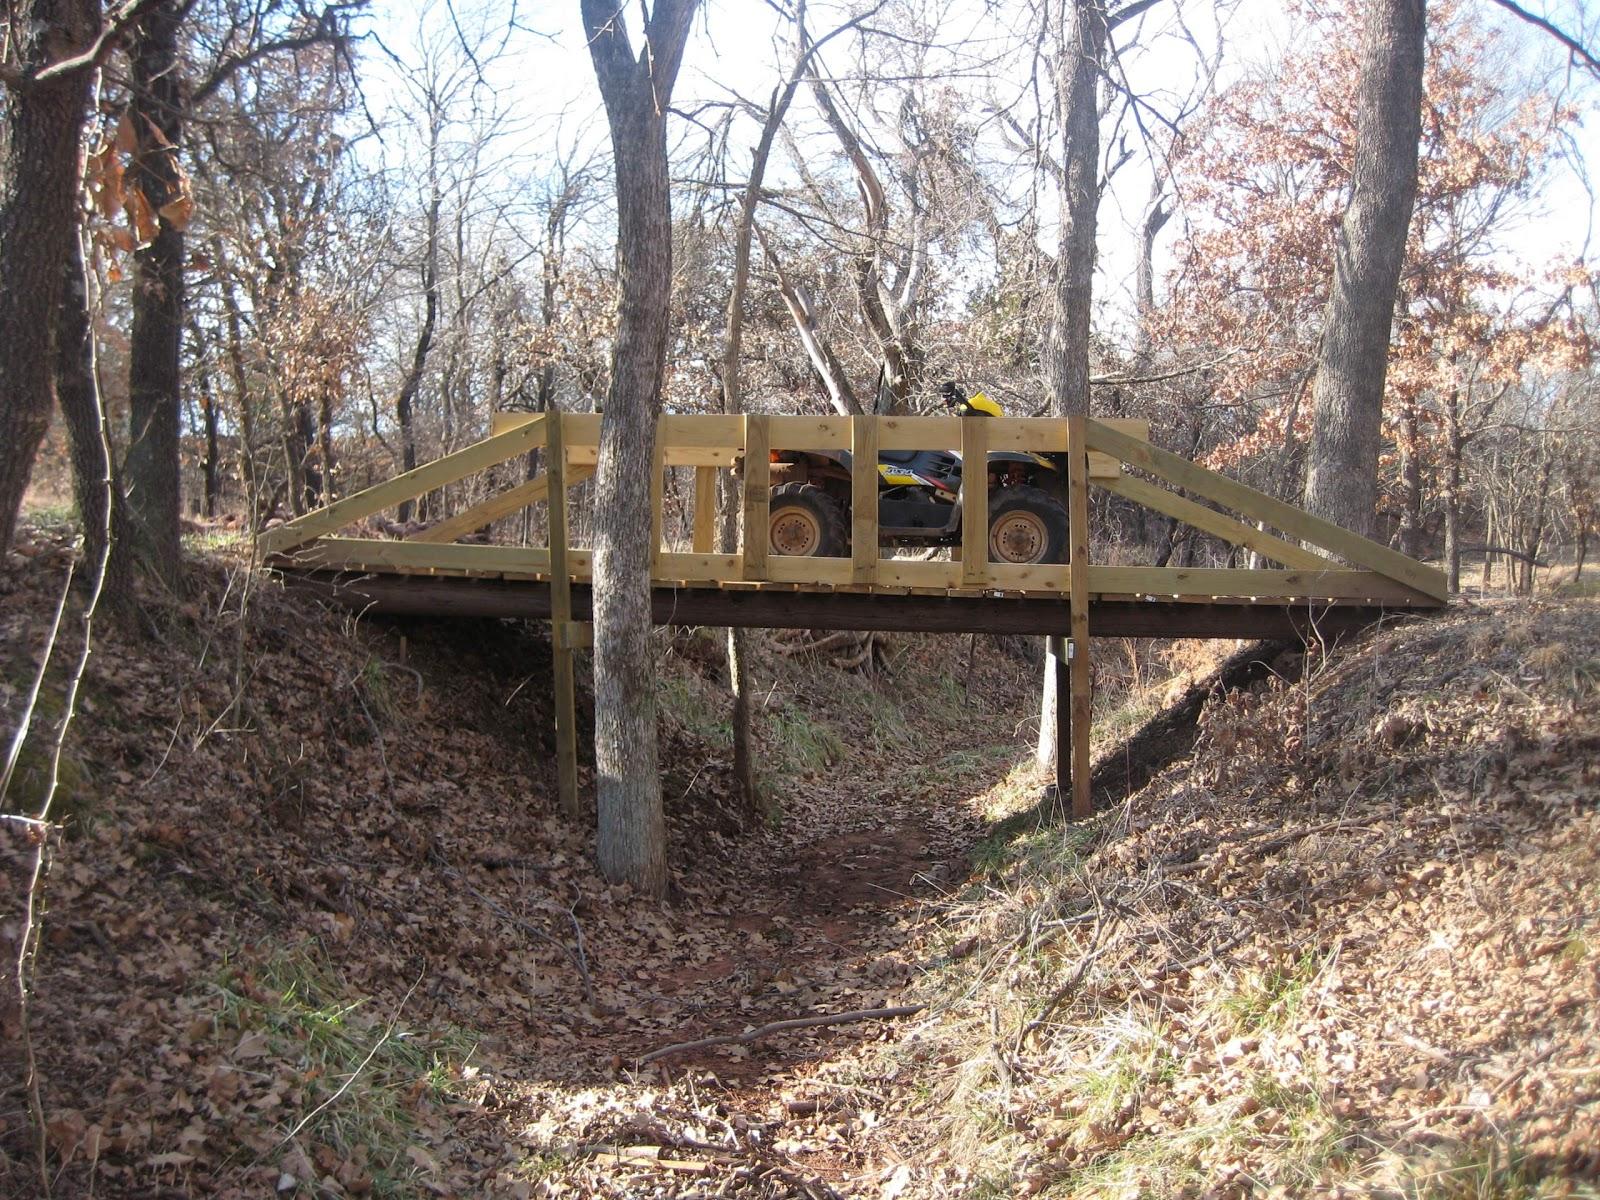 bridge garden picture bridge designs for small creeks. Black Bedroom Furniture Sets. Home Design Ideas